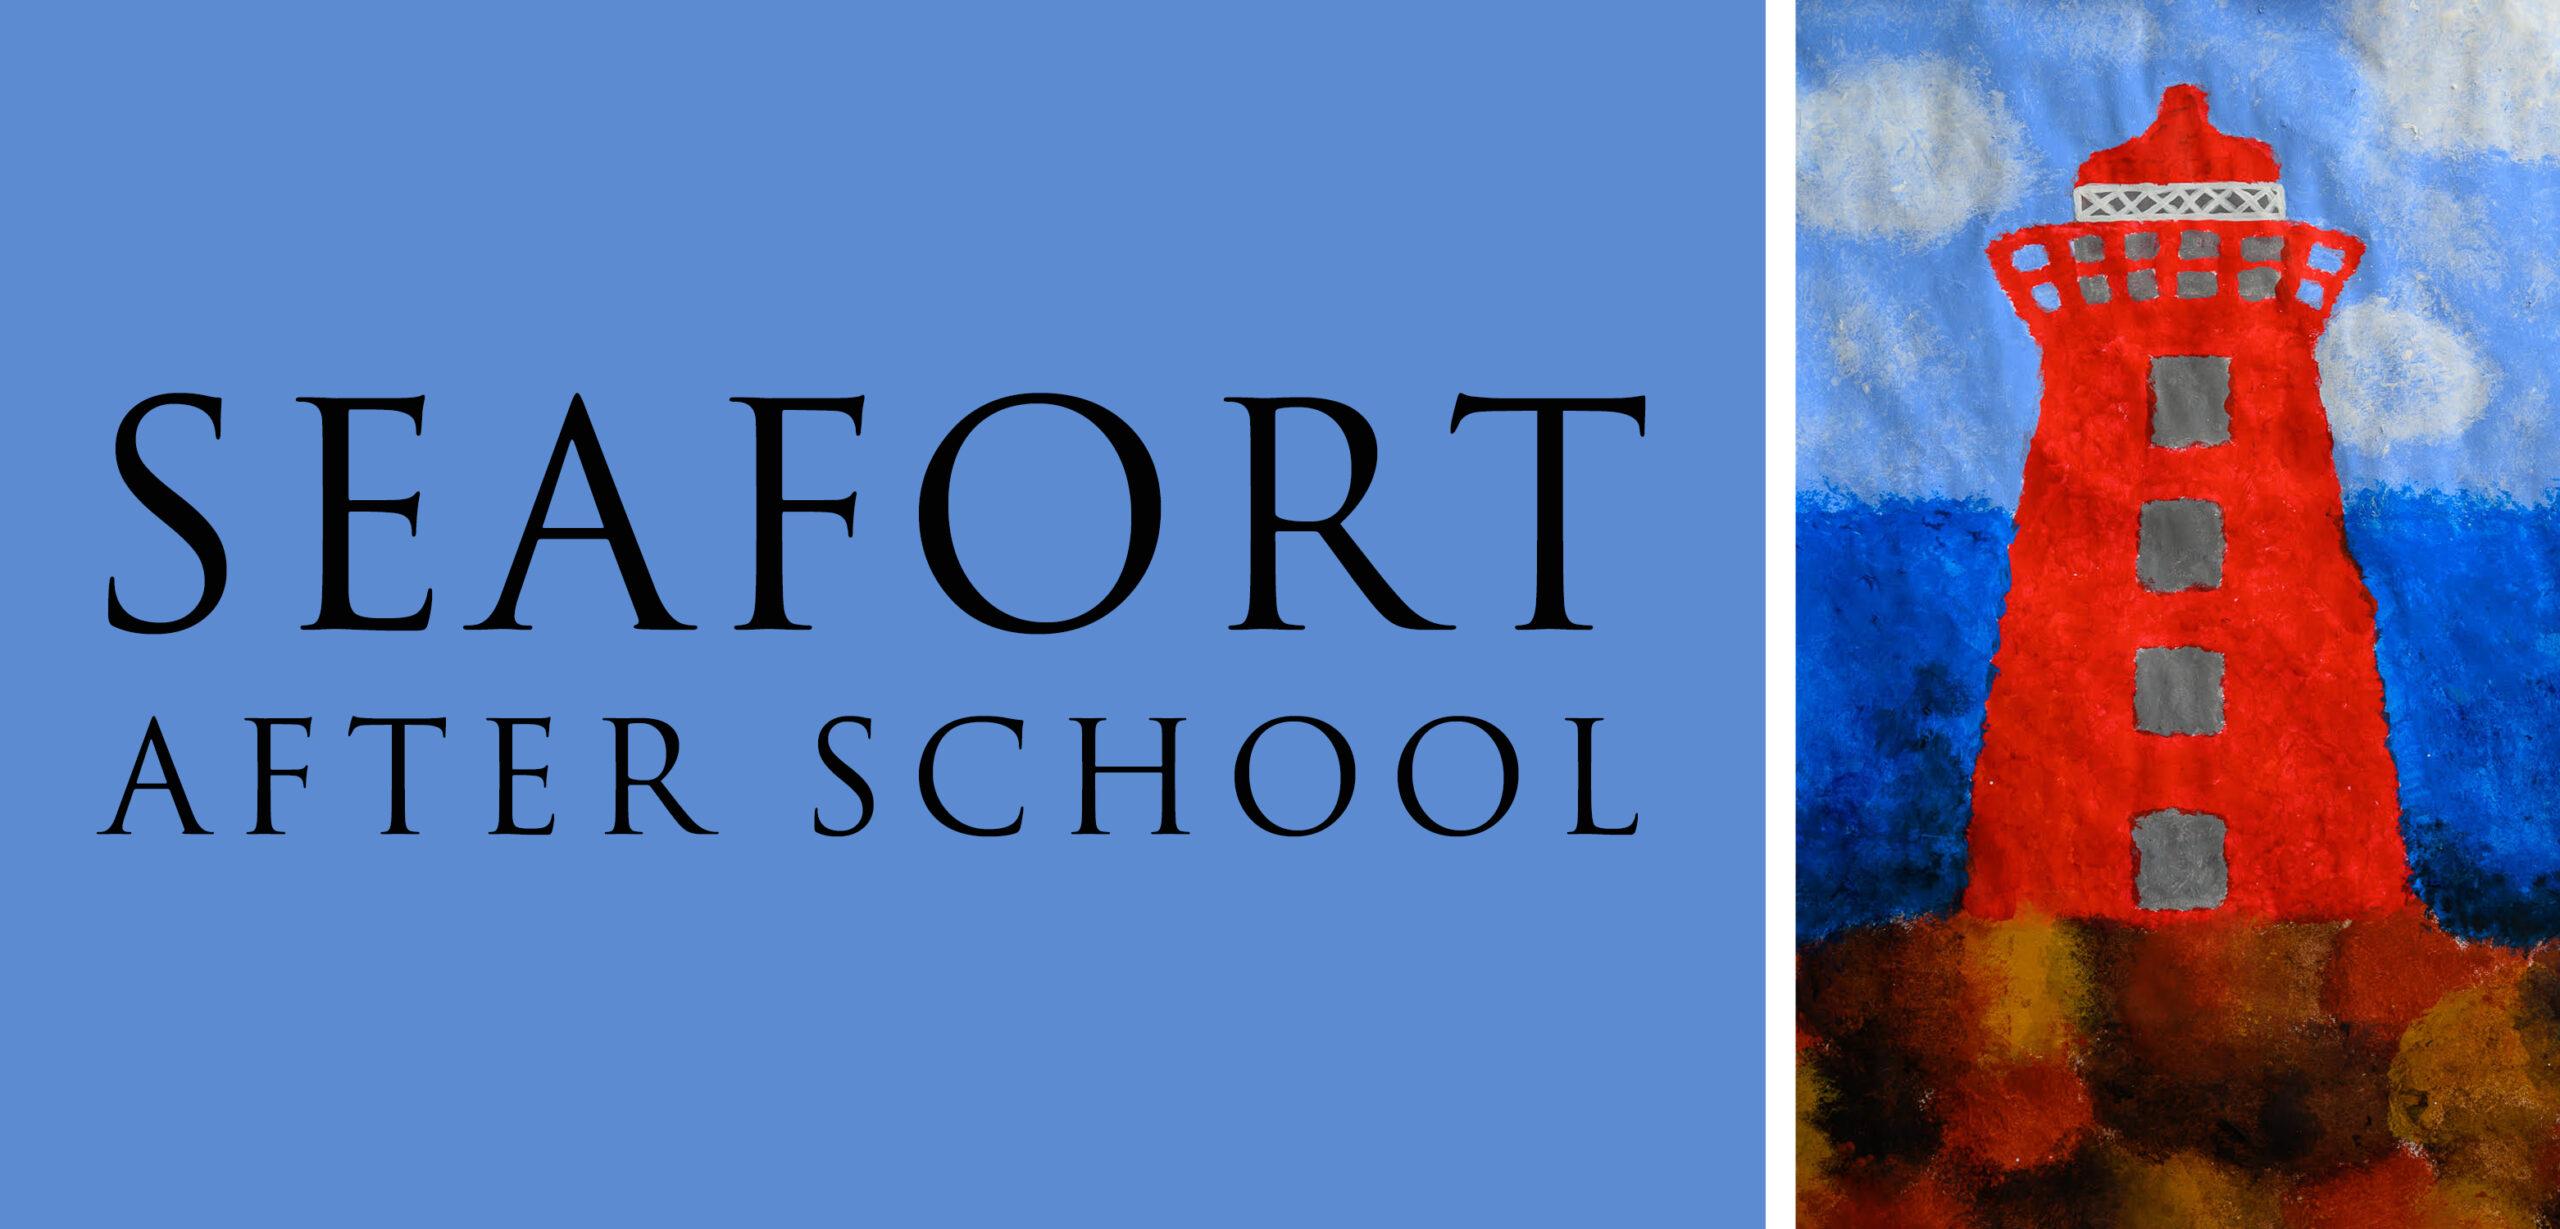 Seafort After School